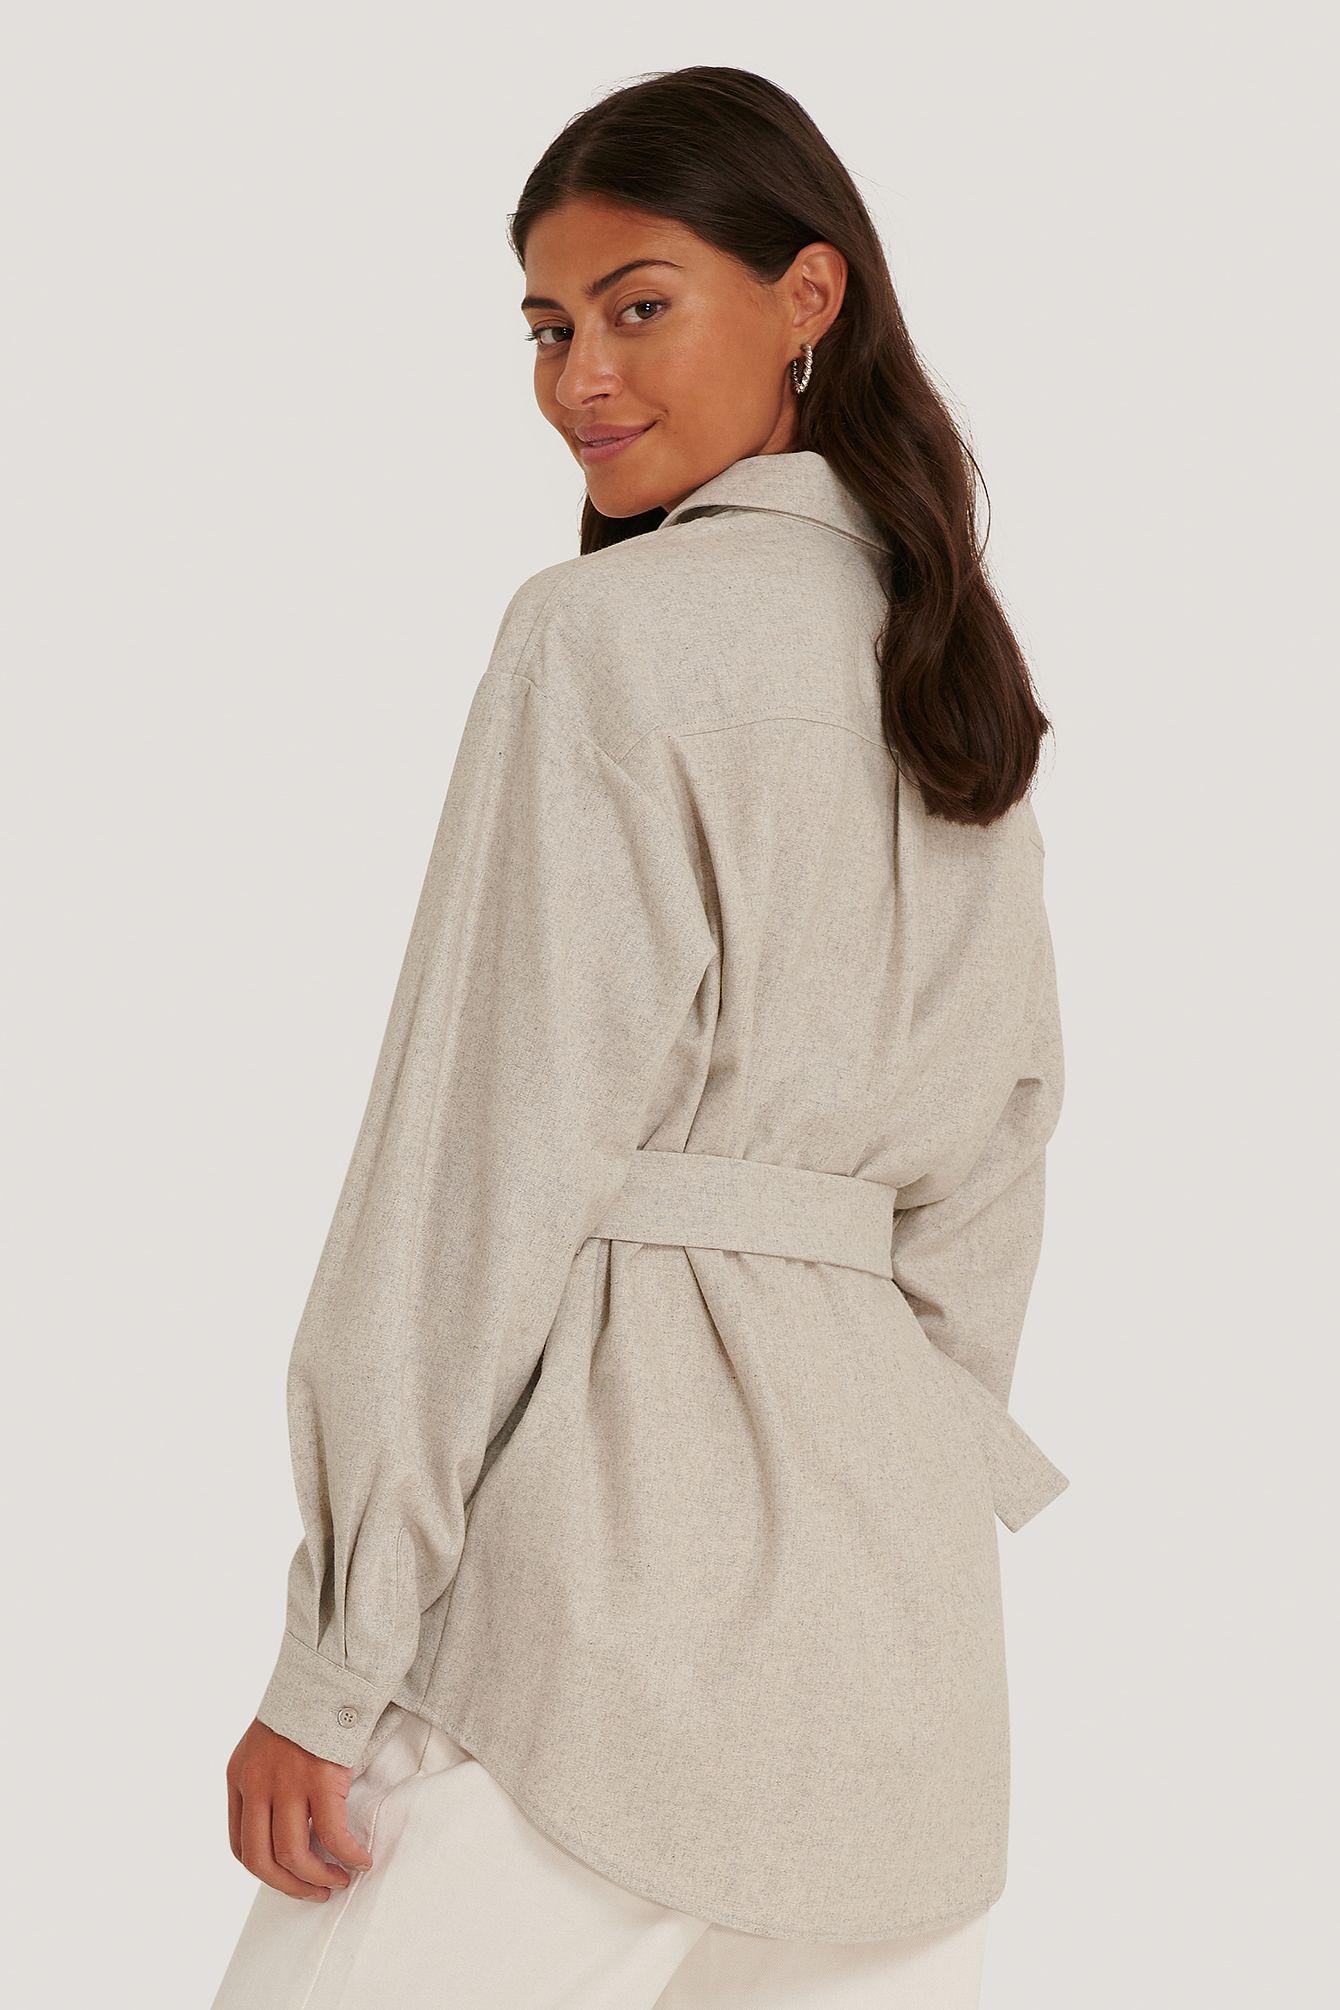 NA-KD oversized shacket, light grey, 34